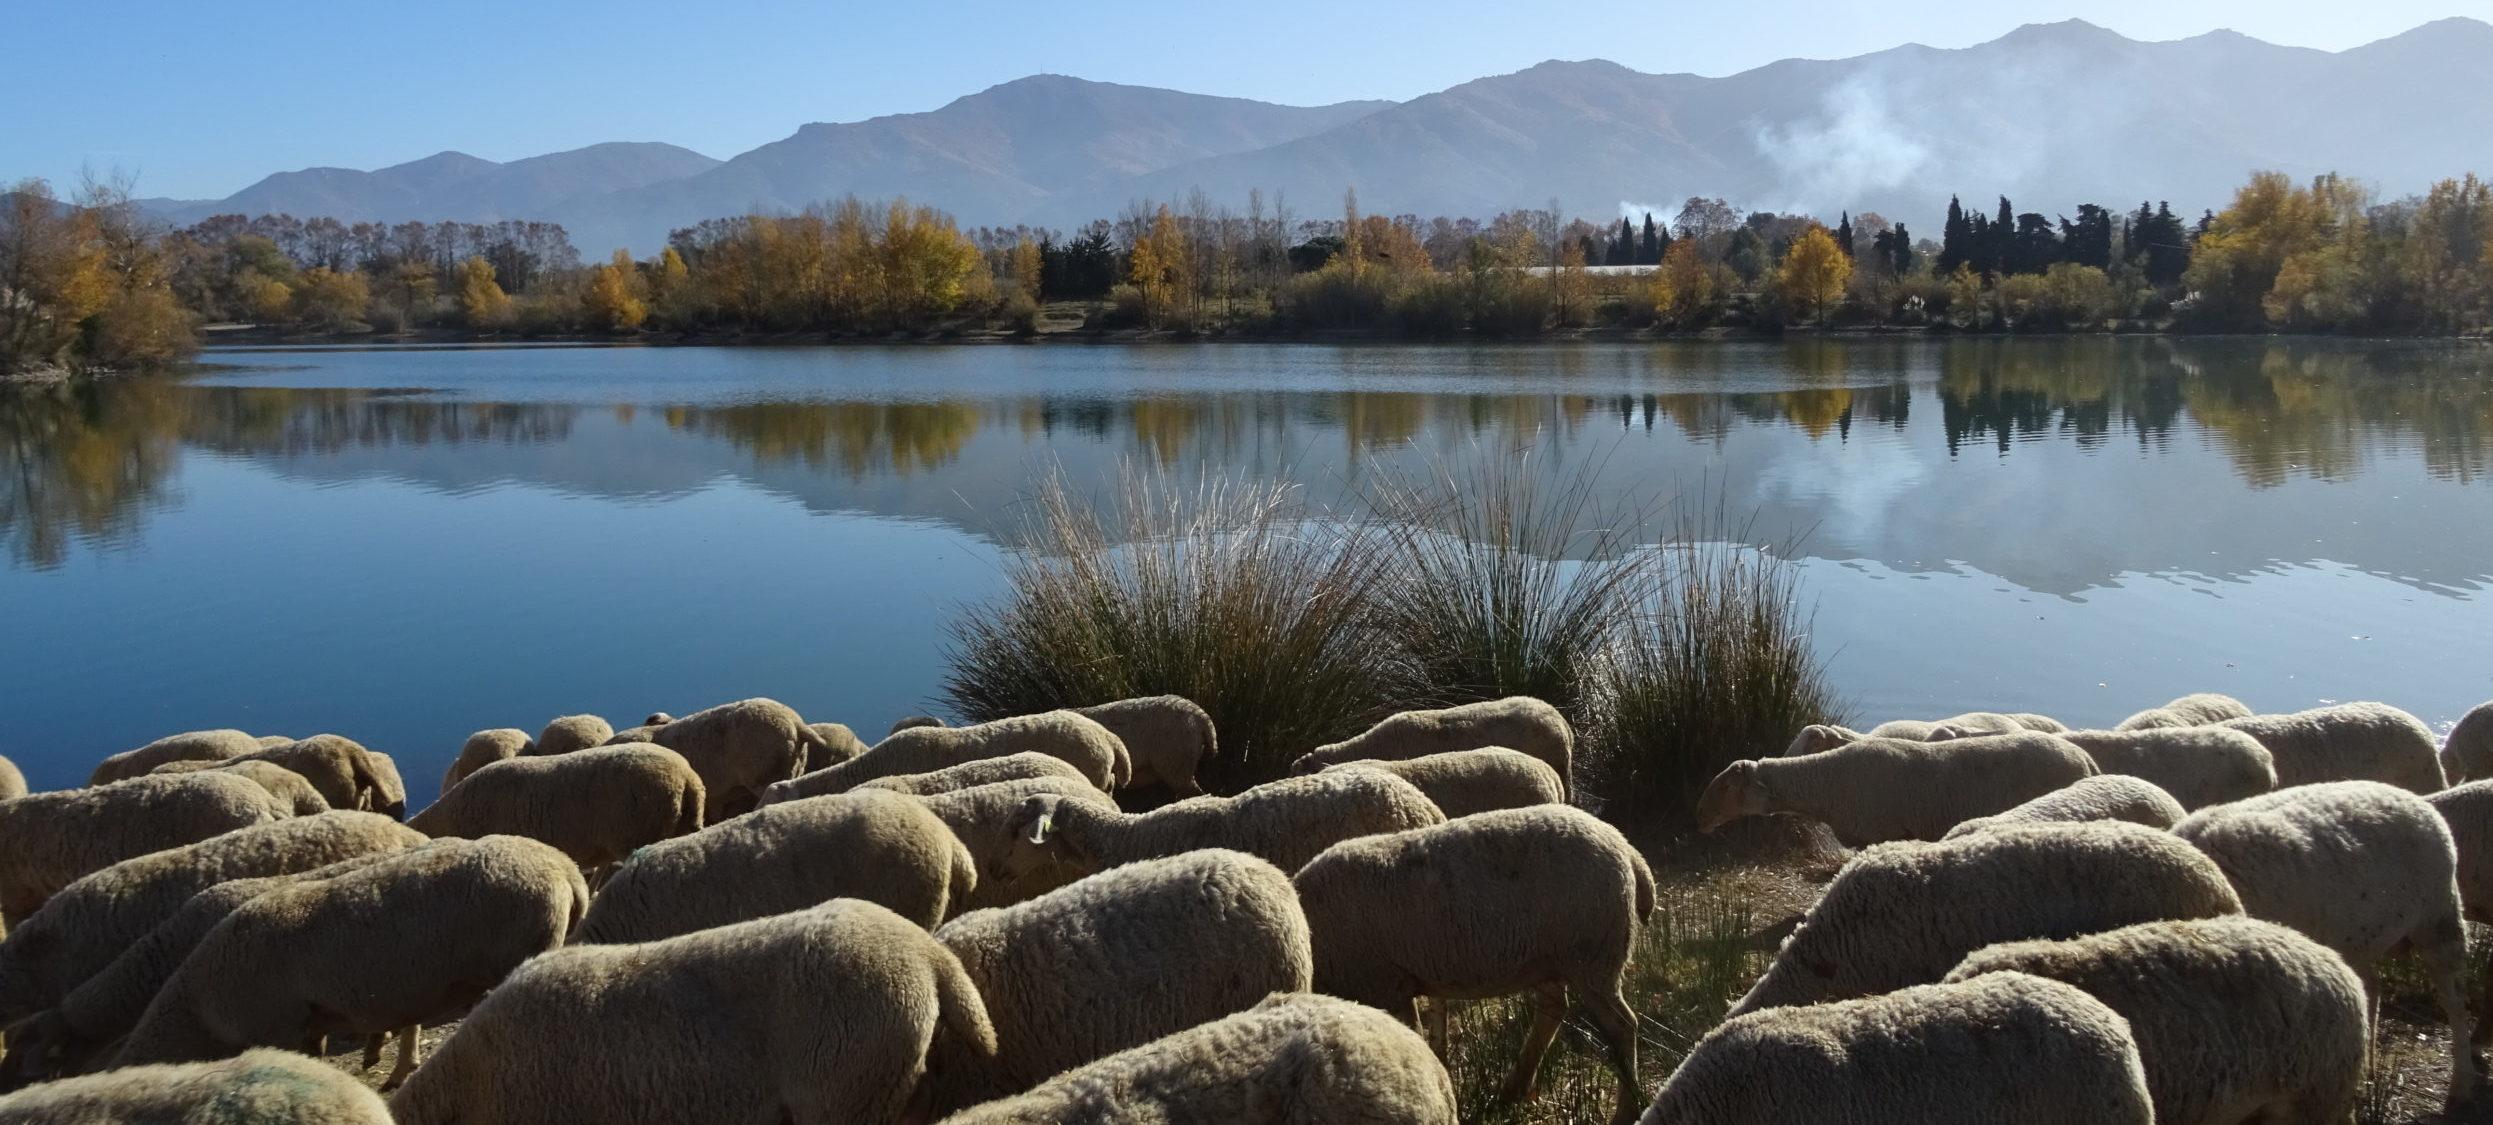 L'agneau nature